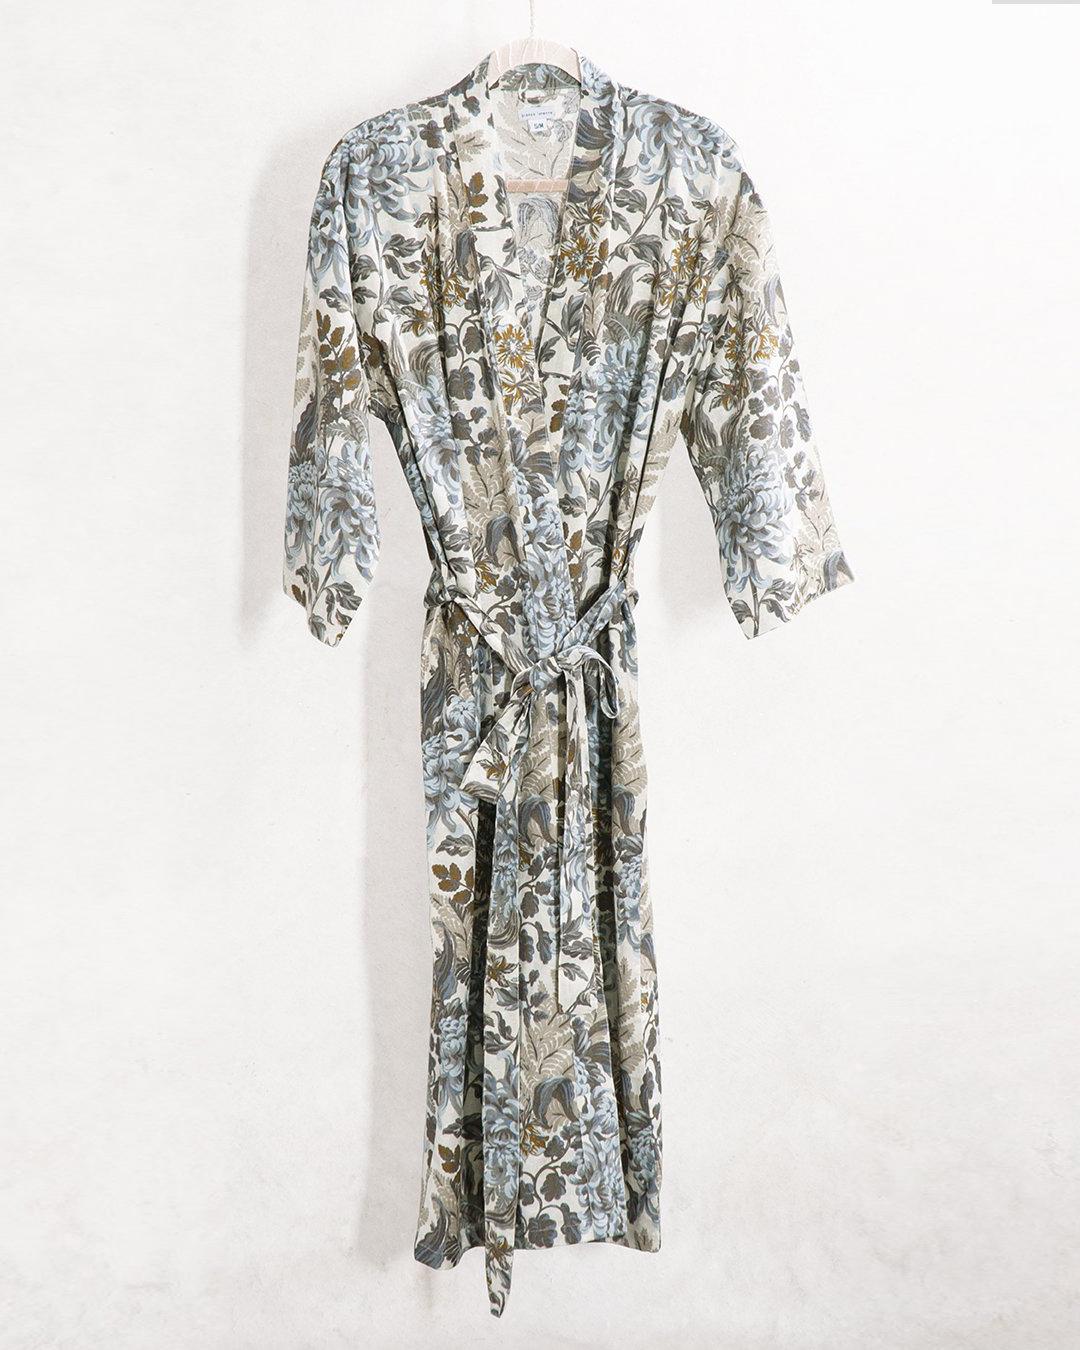 A natural-toned botanical housecoat.